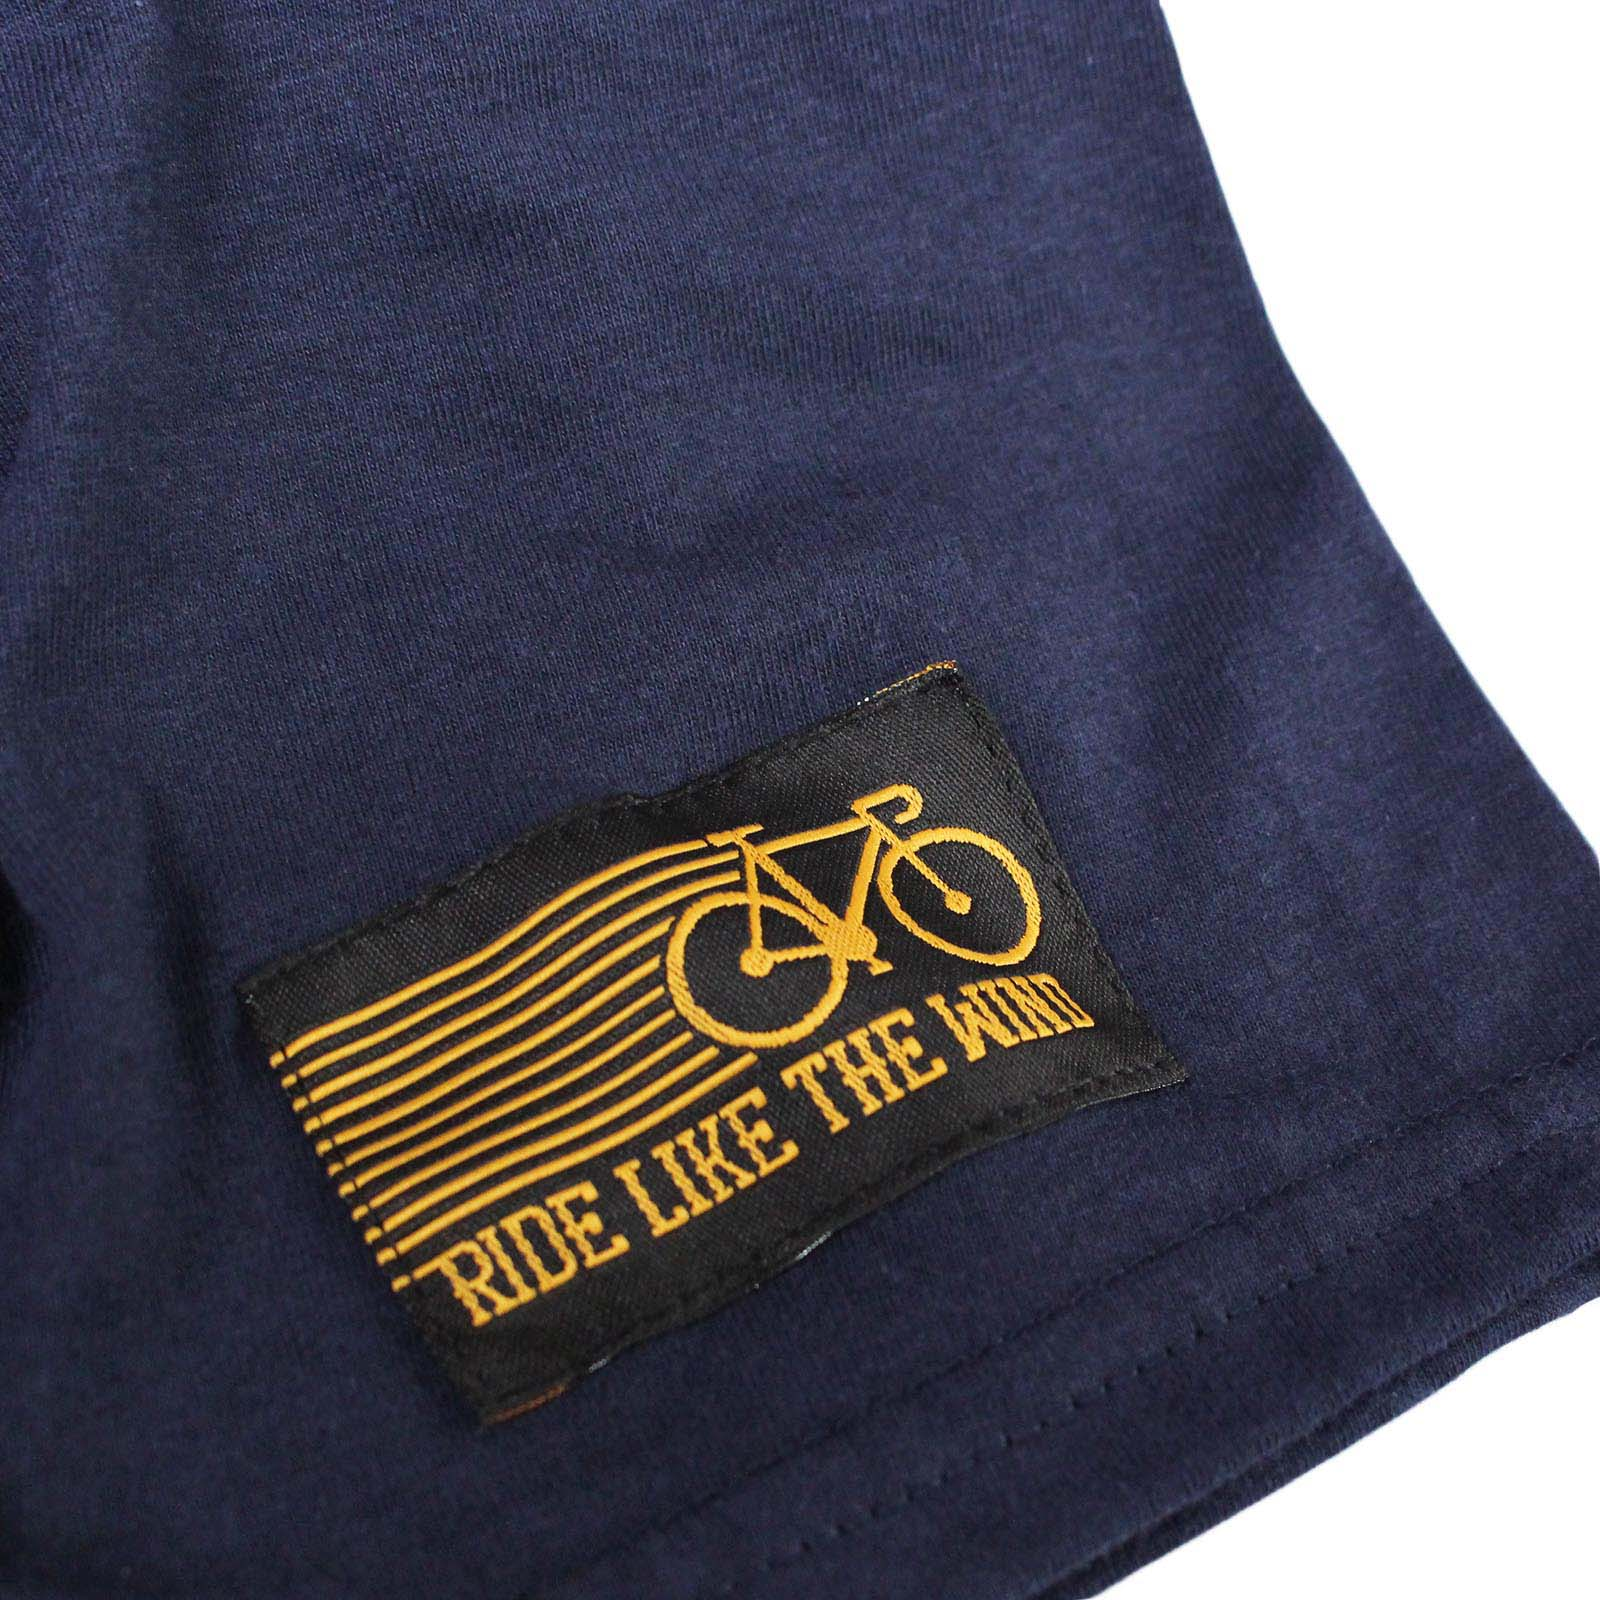 Cycling-T-Shirt-Funny-Novelty-Mens-tee-TShirt-Bike-Part-Words thumbnail 20